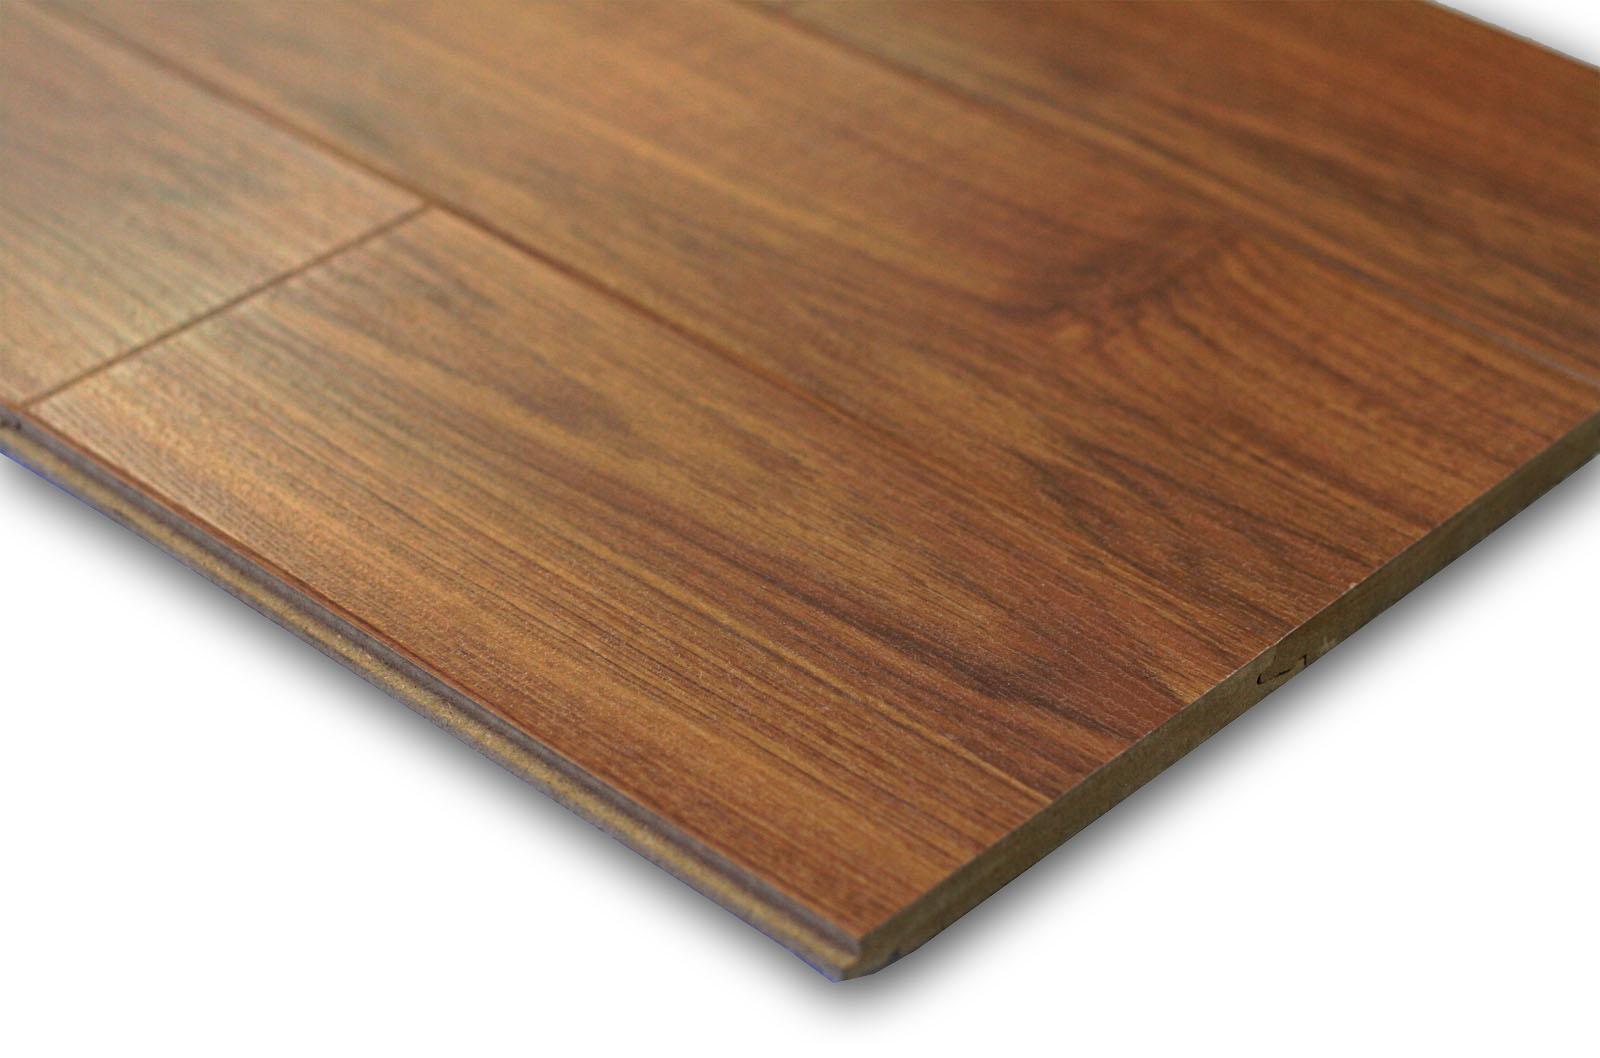 Hardwood Floor VS Laminate HomesFeed